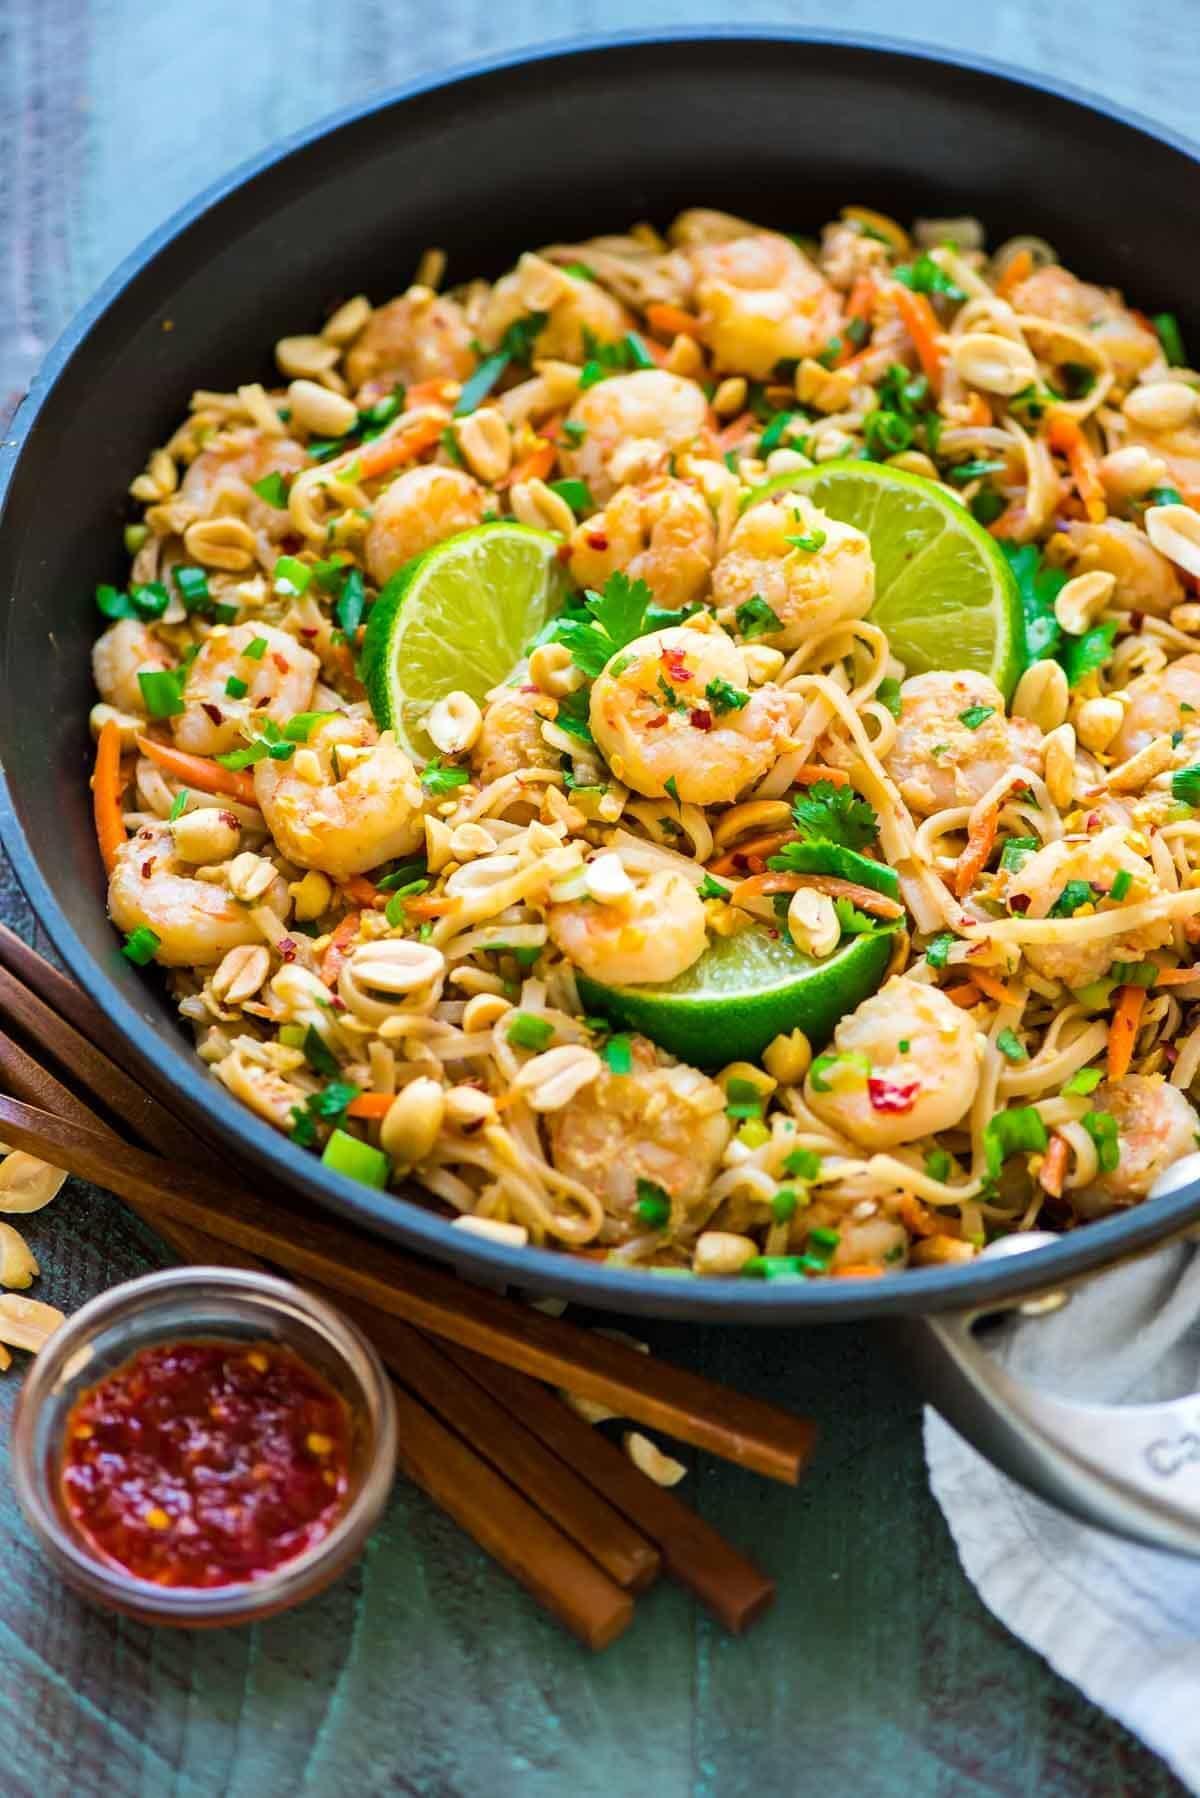 Healthy Shrimp Pad Thai 15 Minutes Wellplated Com